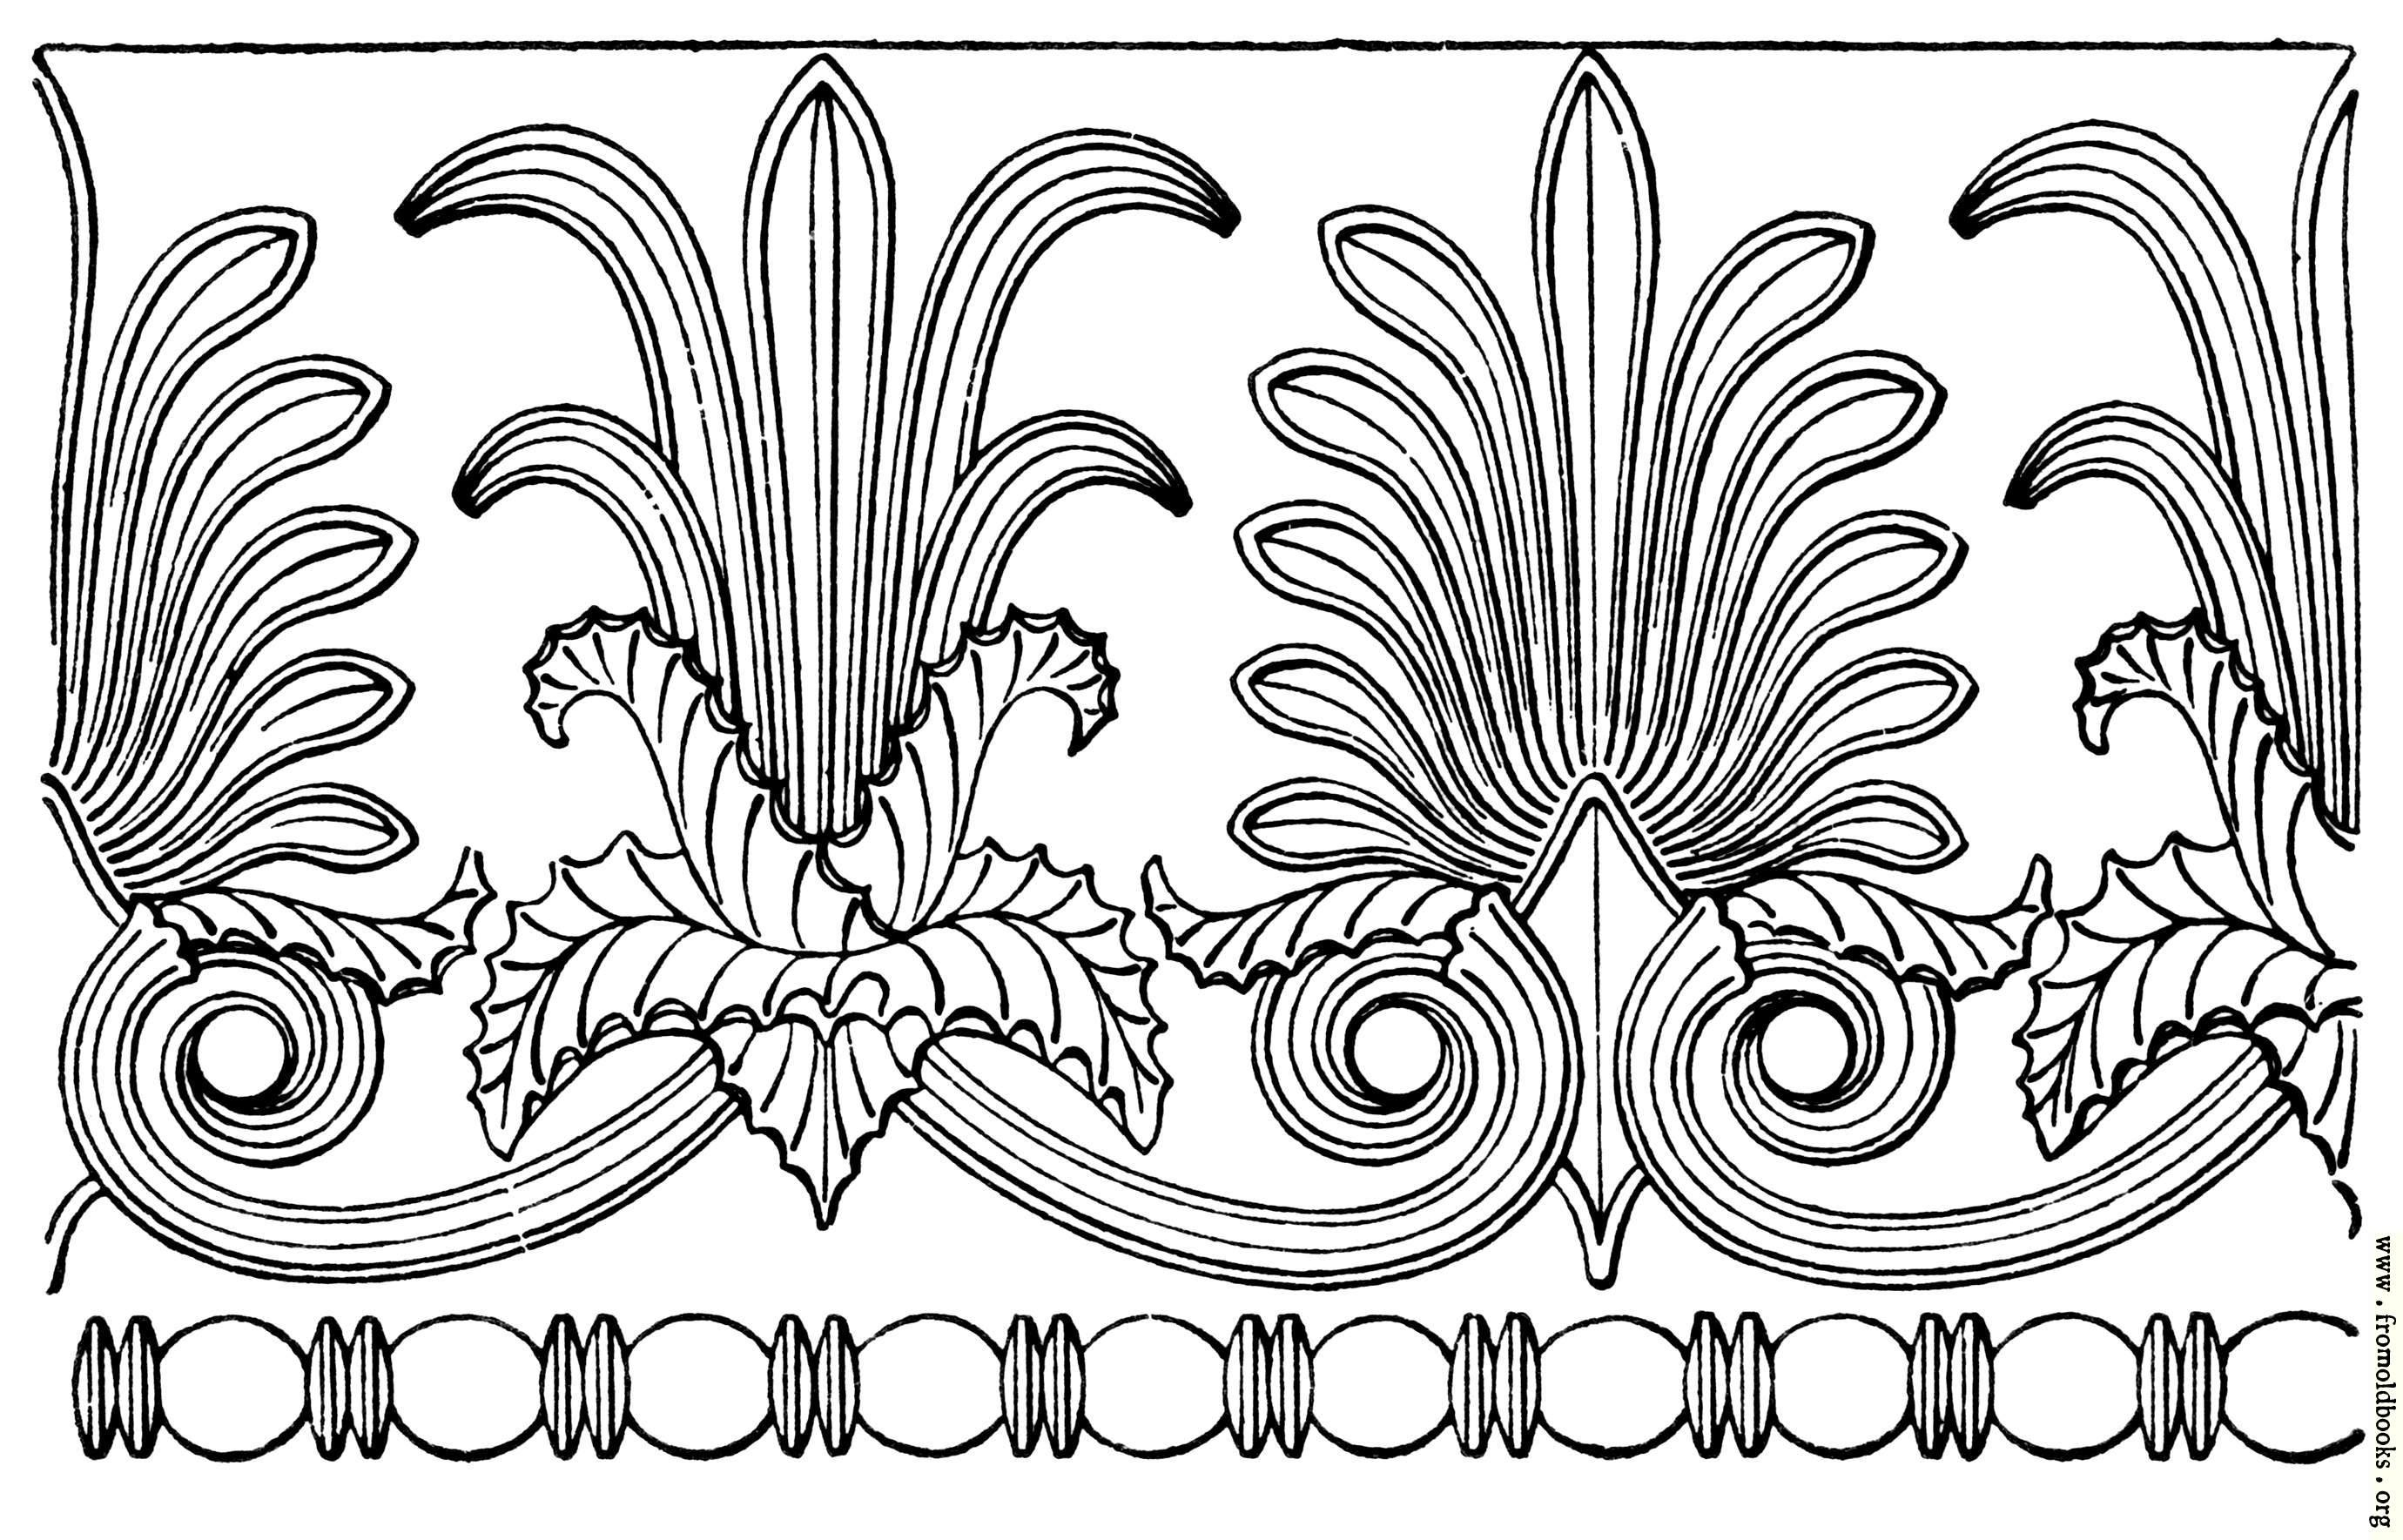 [Picture: Figure 3.54.—Ionic Frieze]